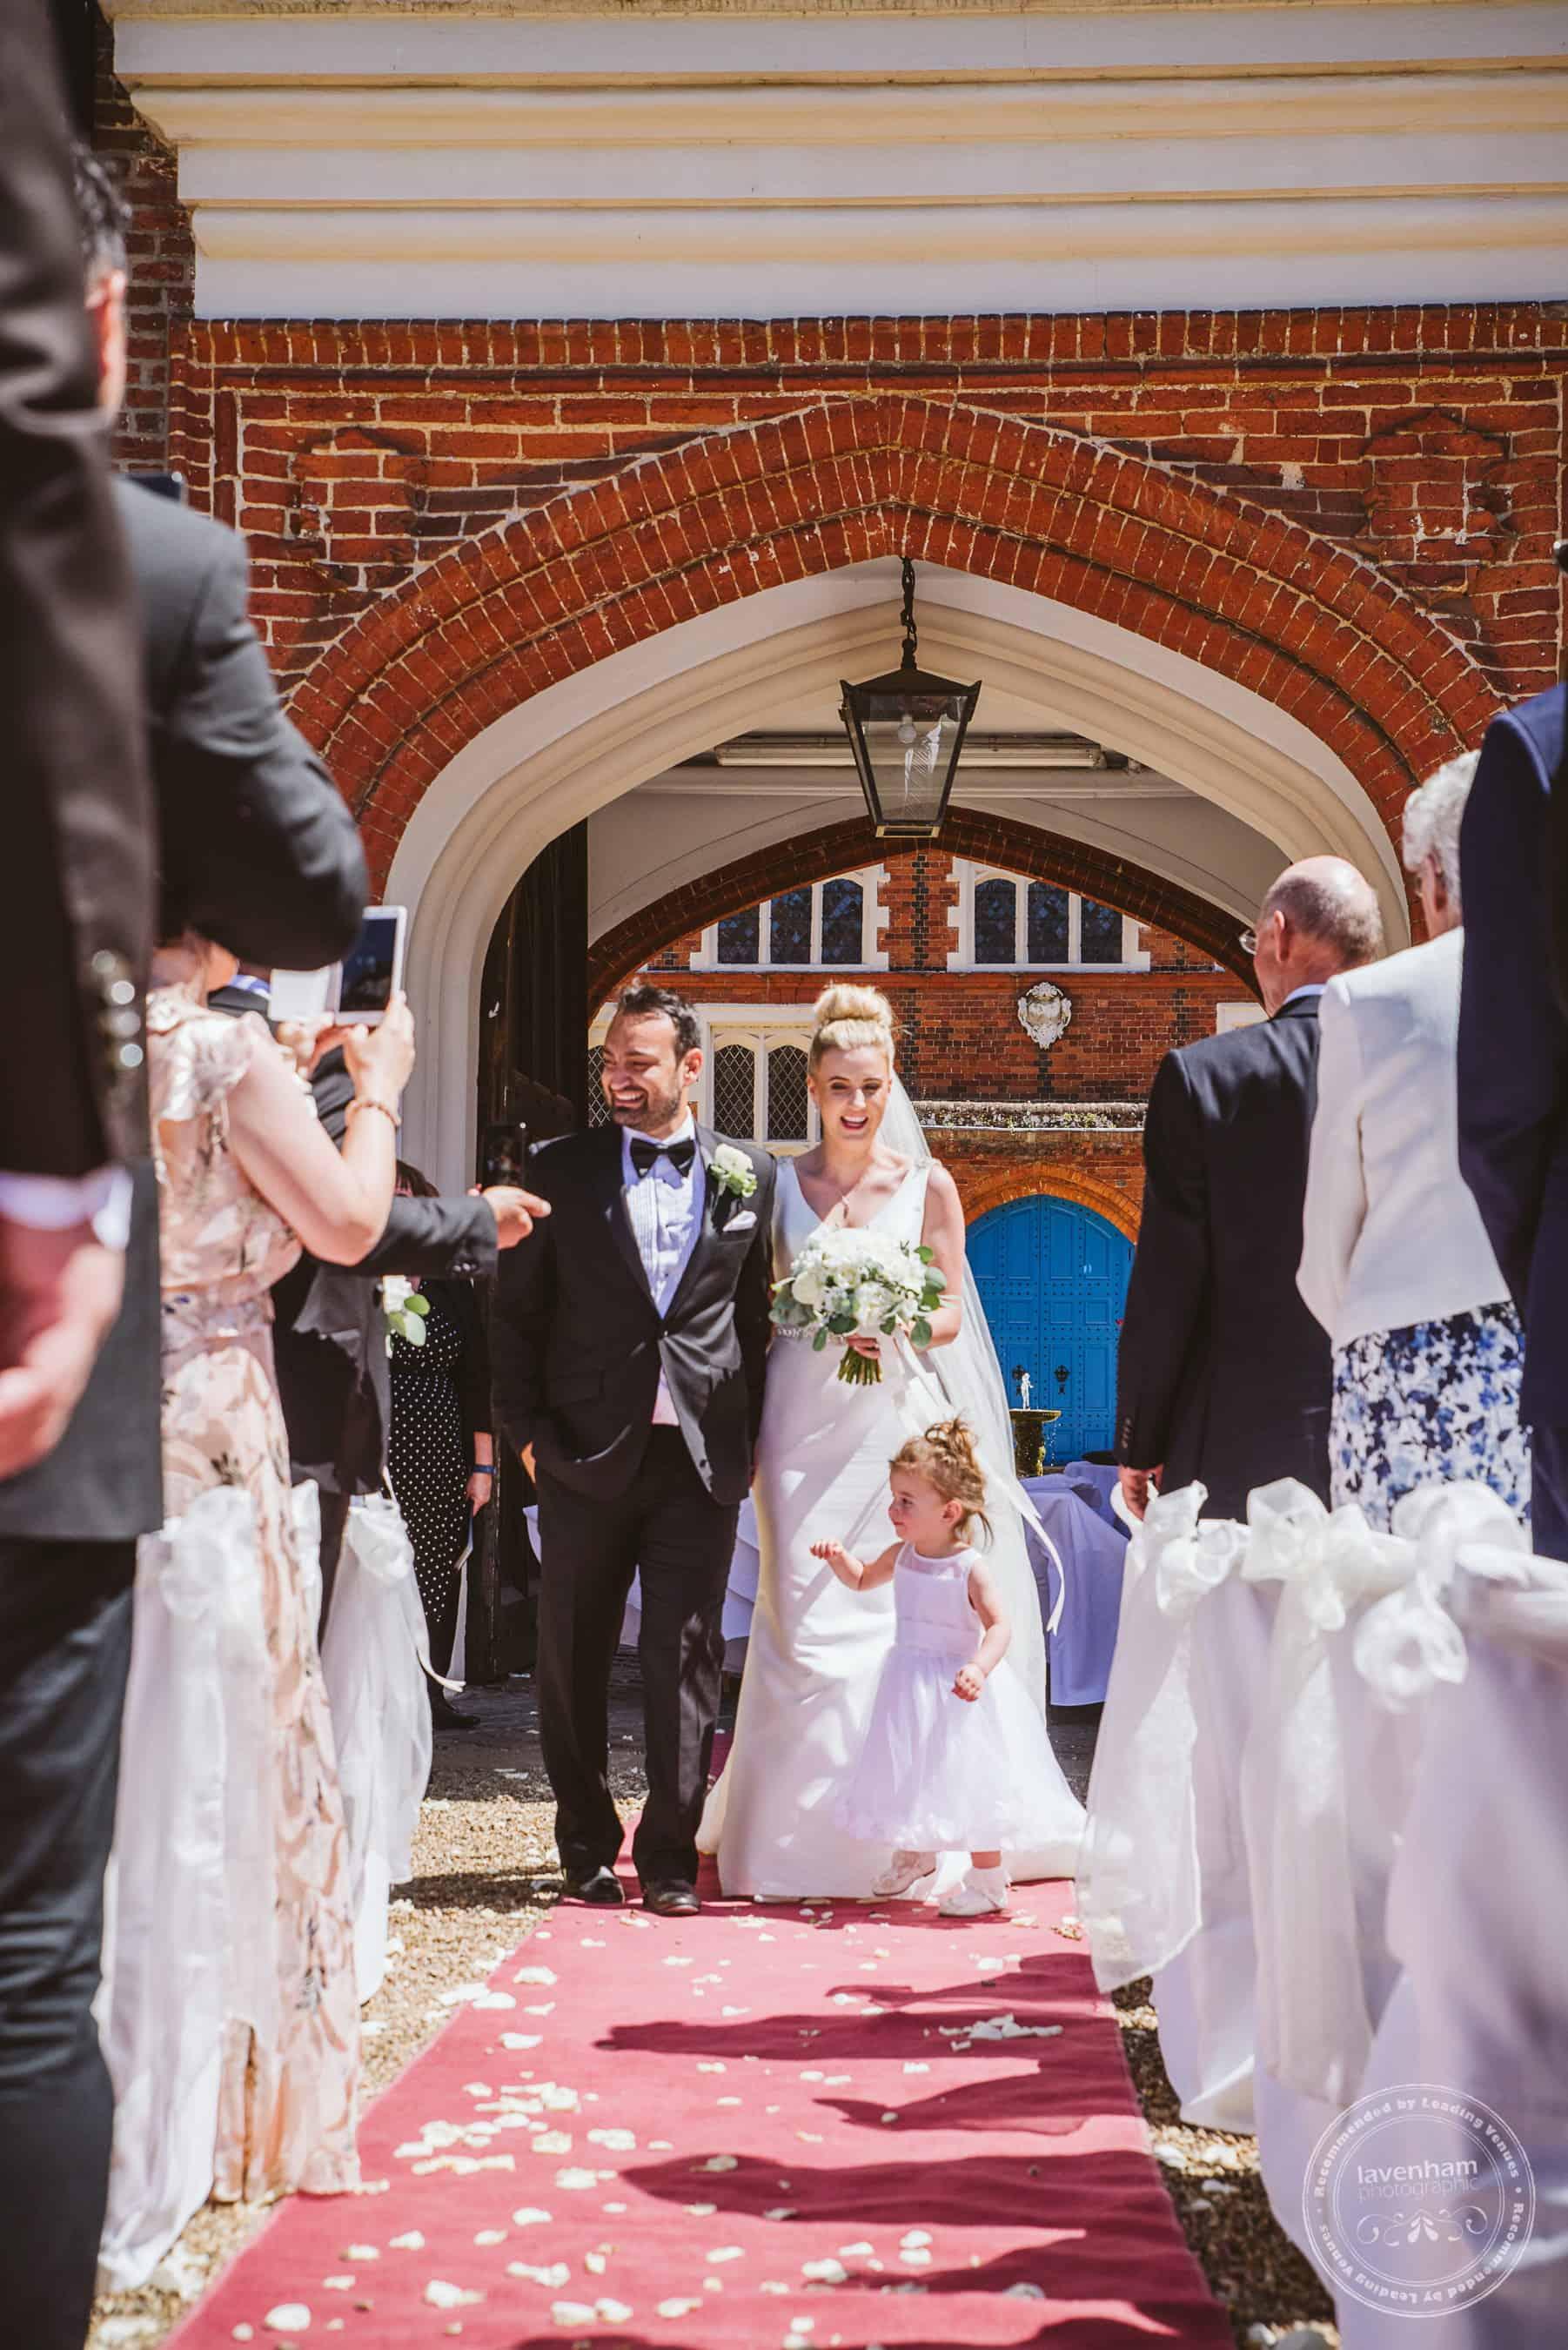 220618 Gosfield Hall Wedding Photography Lavenham Photographic 0090